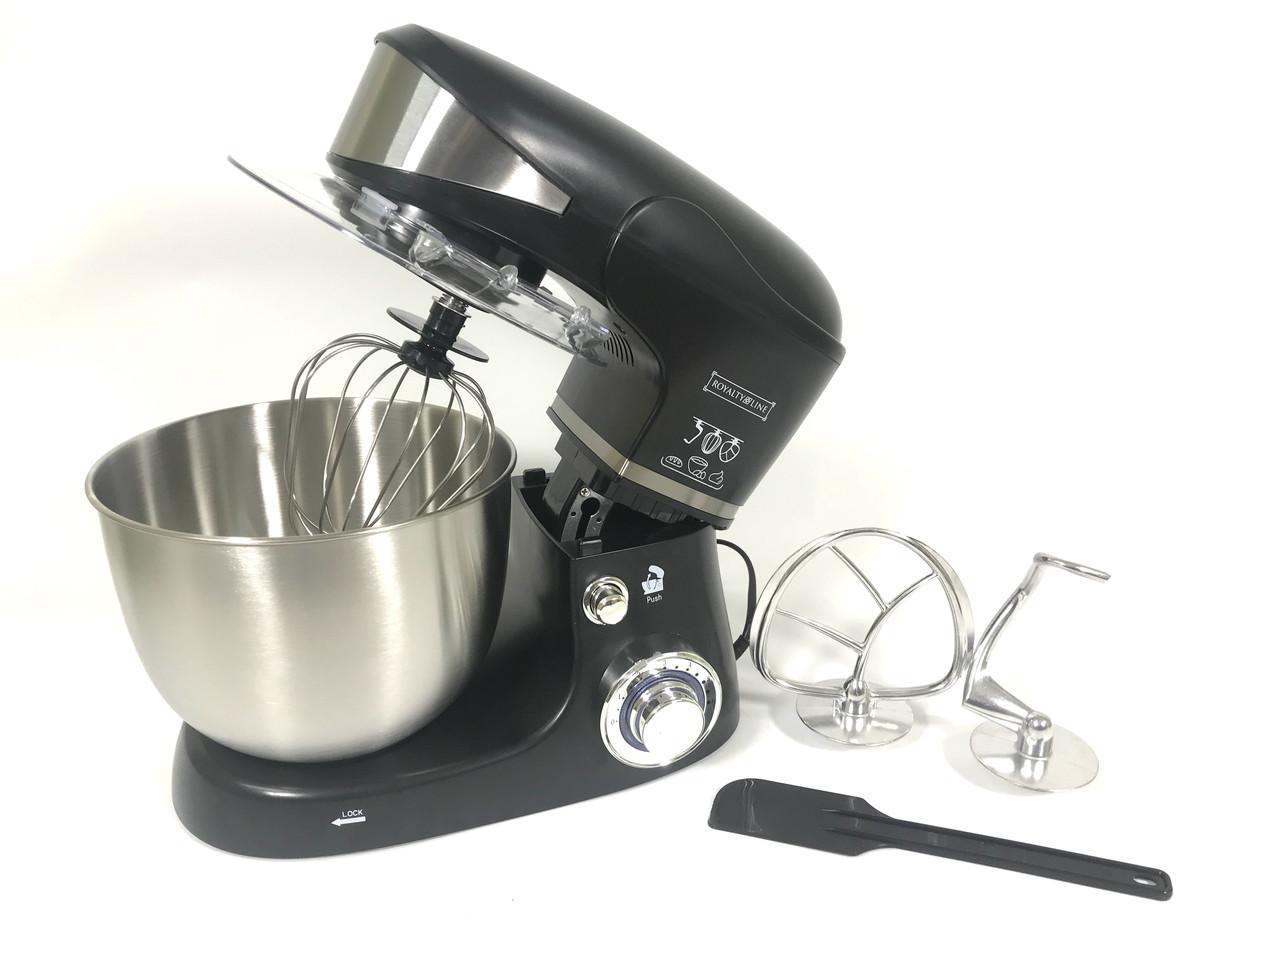 Кухонный комбайн Royalty Line PKM-1600 black